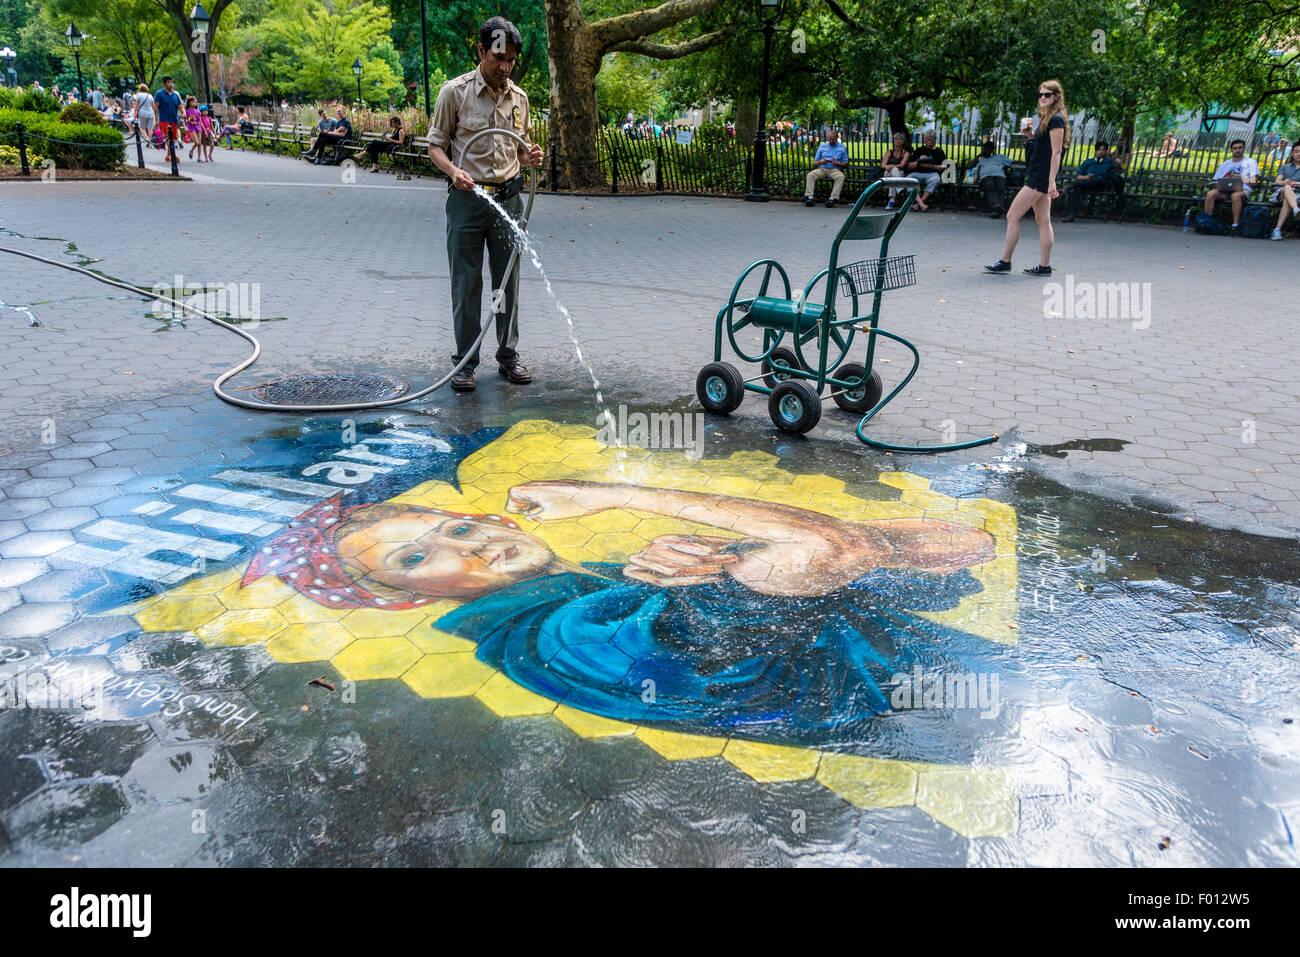 New York, NY versucht 5. August 2015 - A Parks Department Arbeiter eine Hillary Mural im Washington Square Park Stockbild